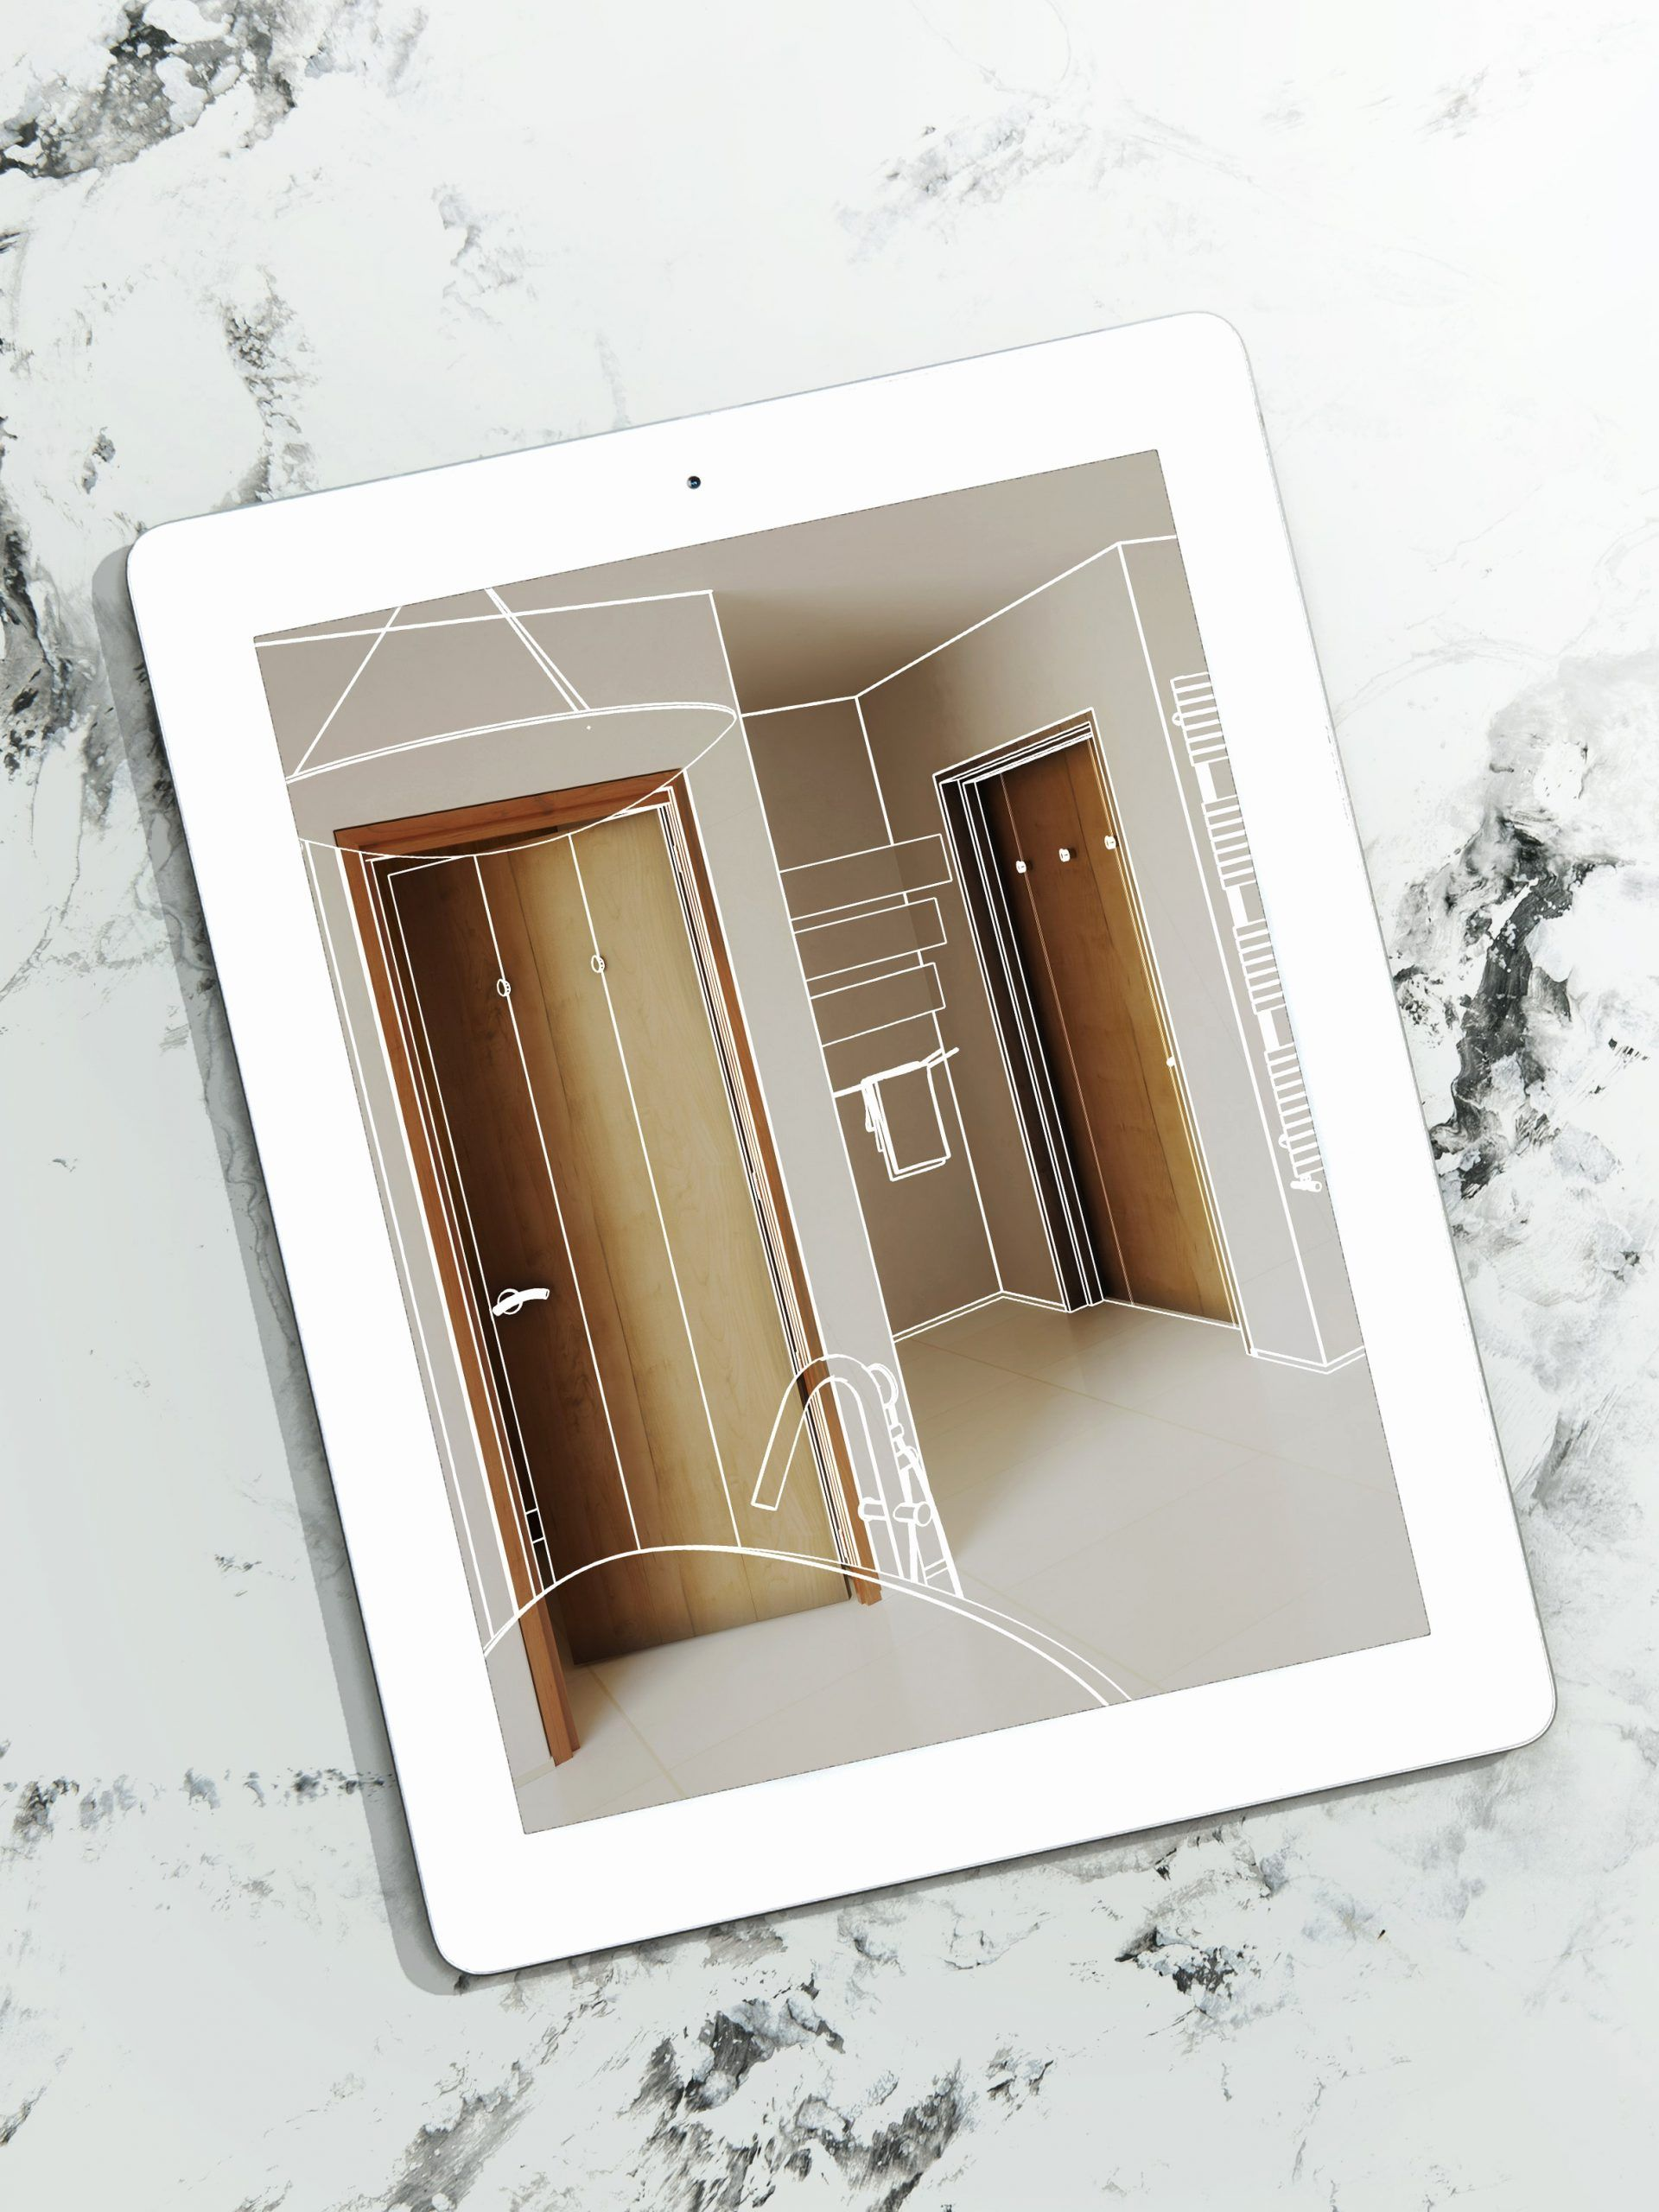 Free Home Design Software And Interior Design Software Autodesk Homestyler Elegant 1 Home Design Software 3d Interior Design Software Home Design Software Free